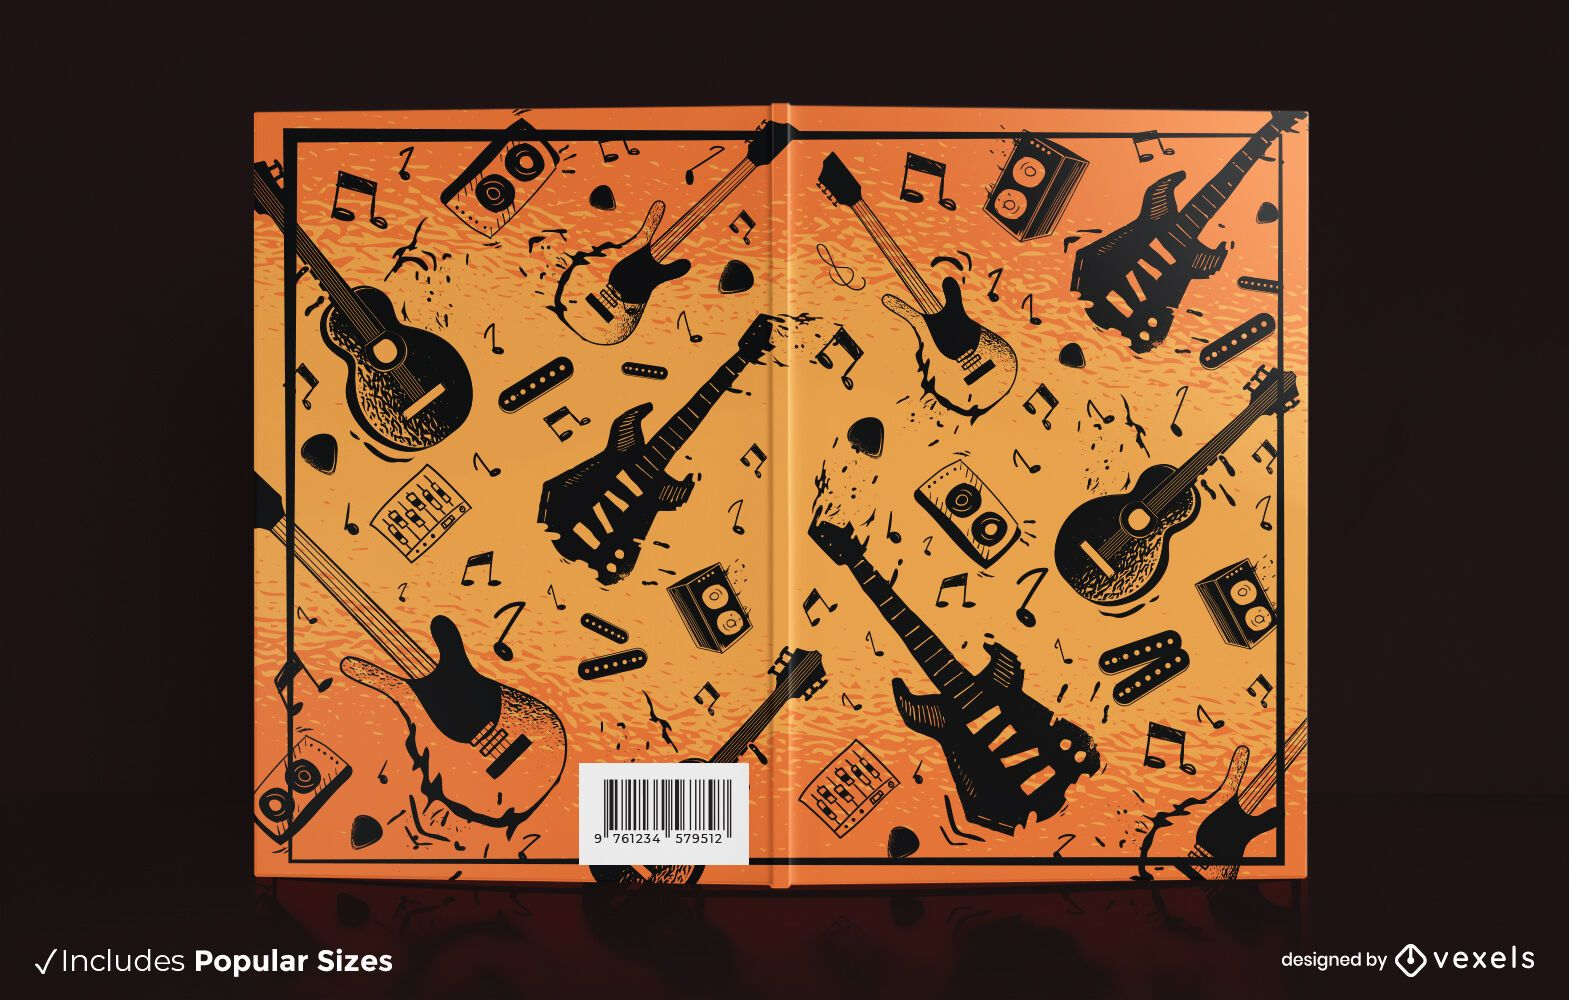 Electric guitars book cover design